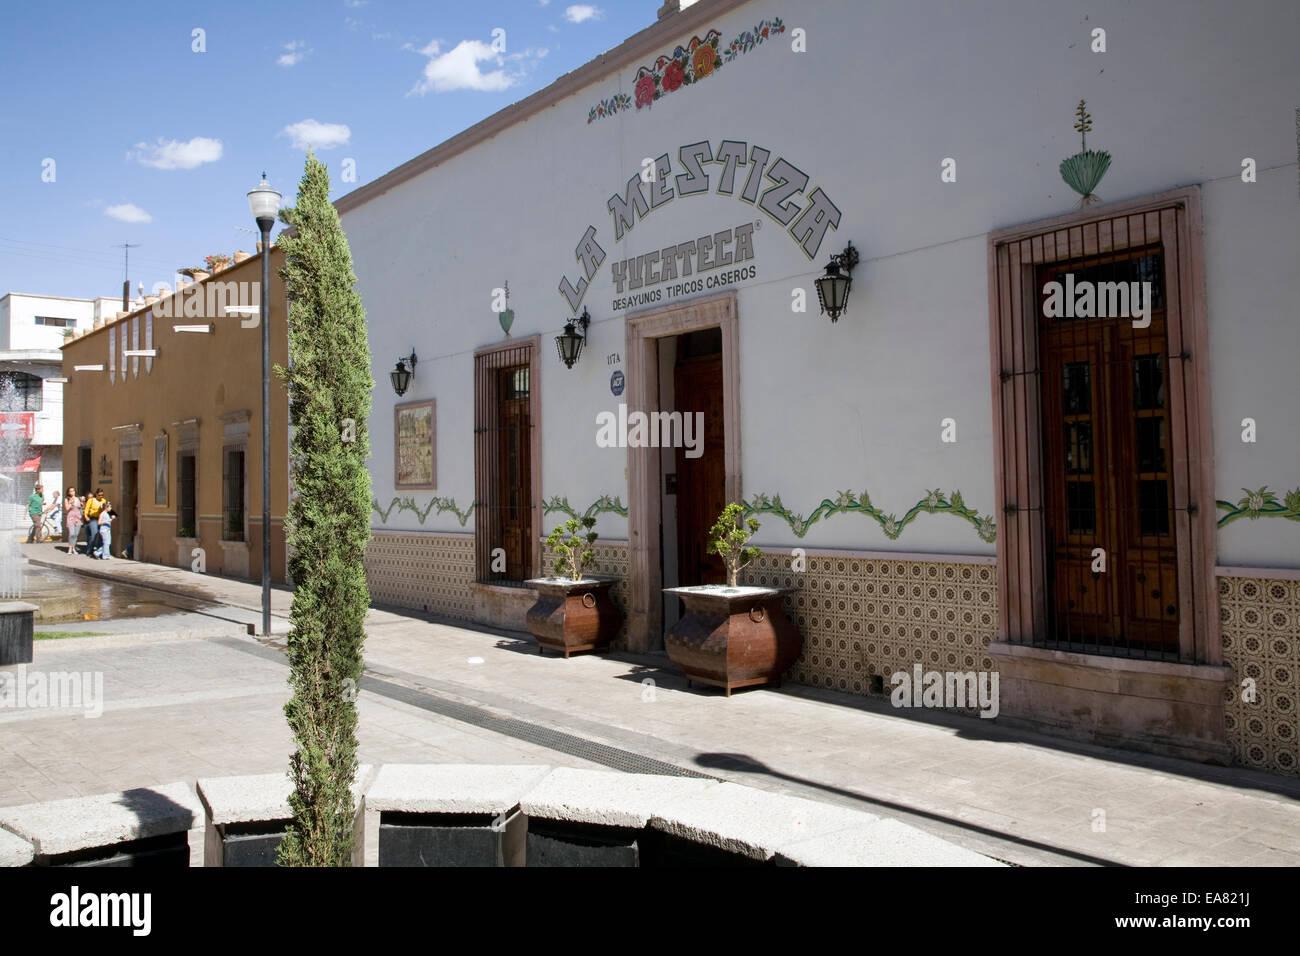 Jardin De La Paz In Stock Photos & Jardin De La Paz In Stock Images ...